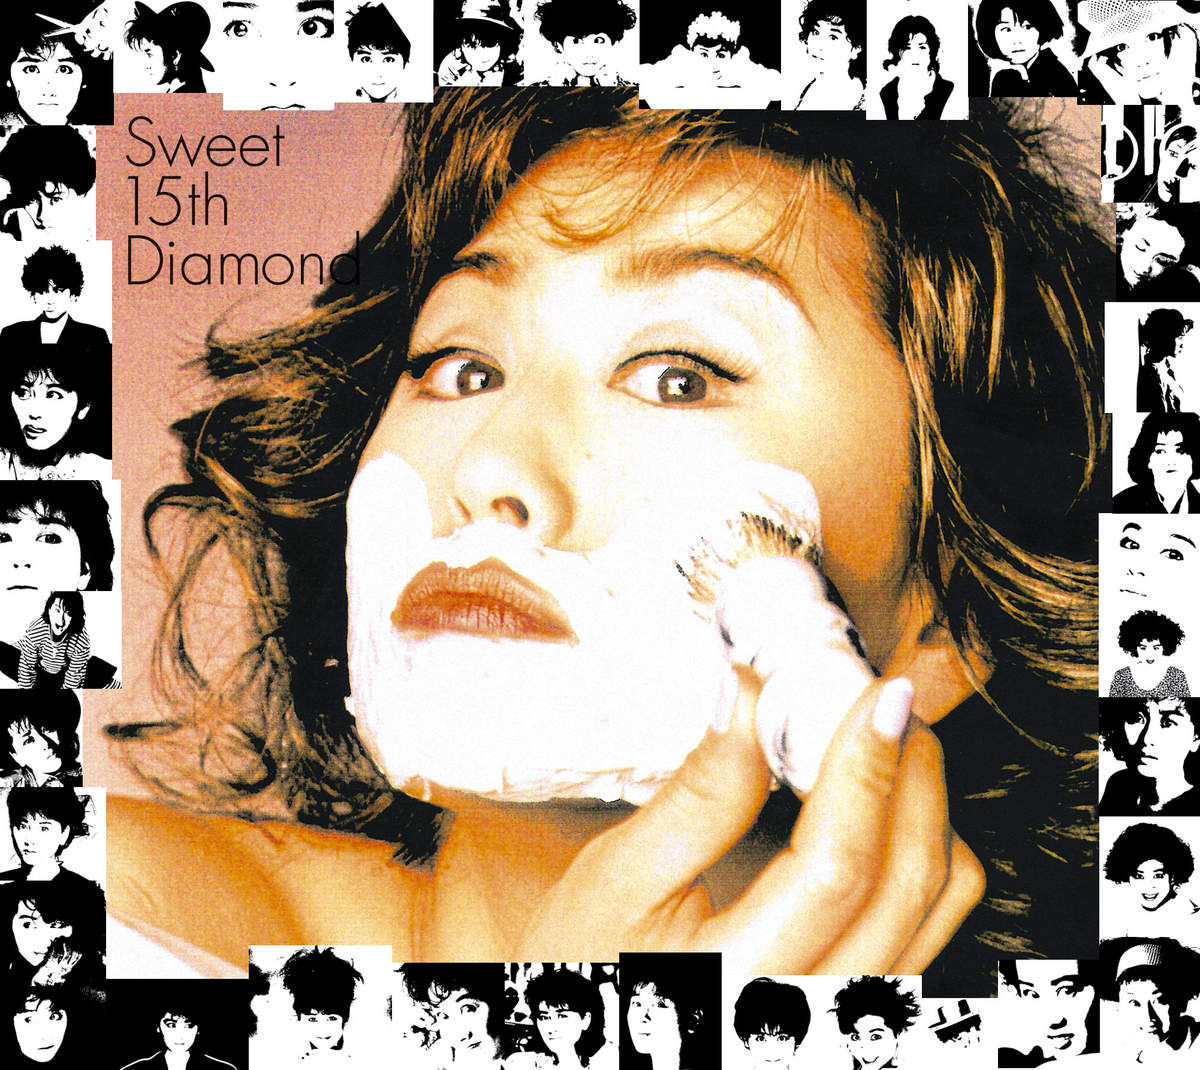 20181009.2002.07 Misato Watanabe - Sweet 15th Diamond (2000) (FLAC) cover.jpg